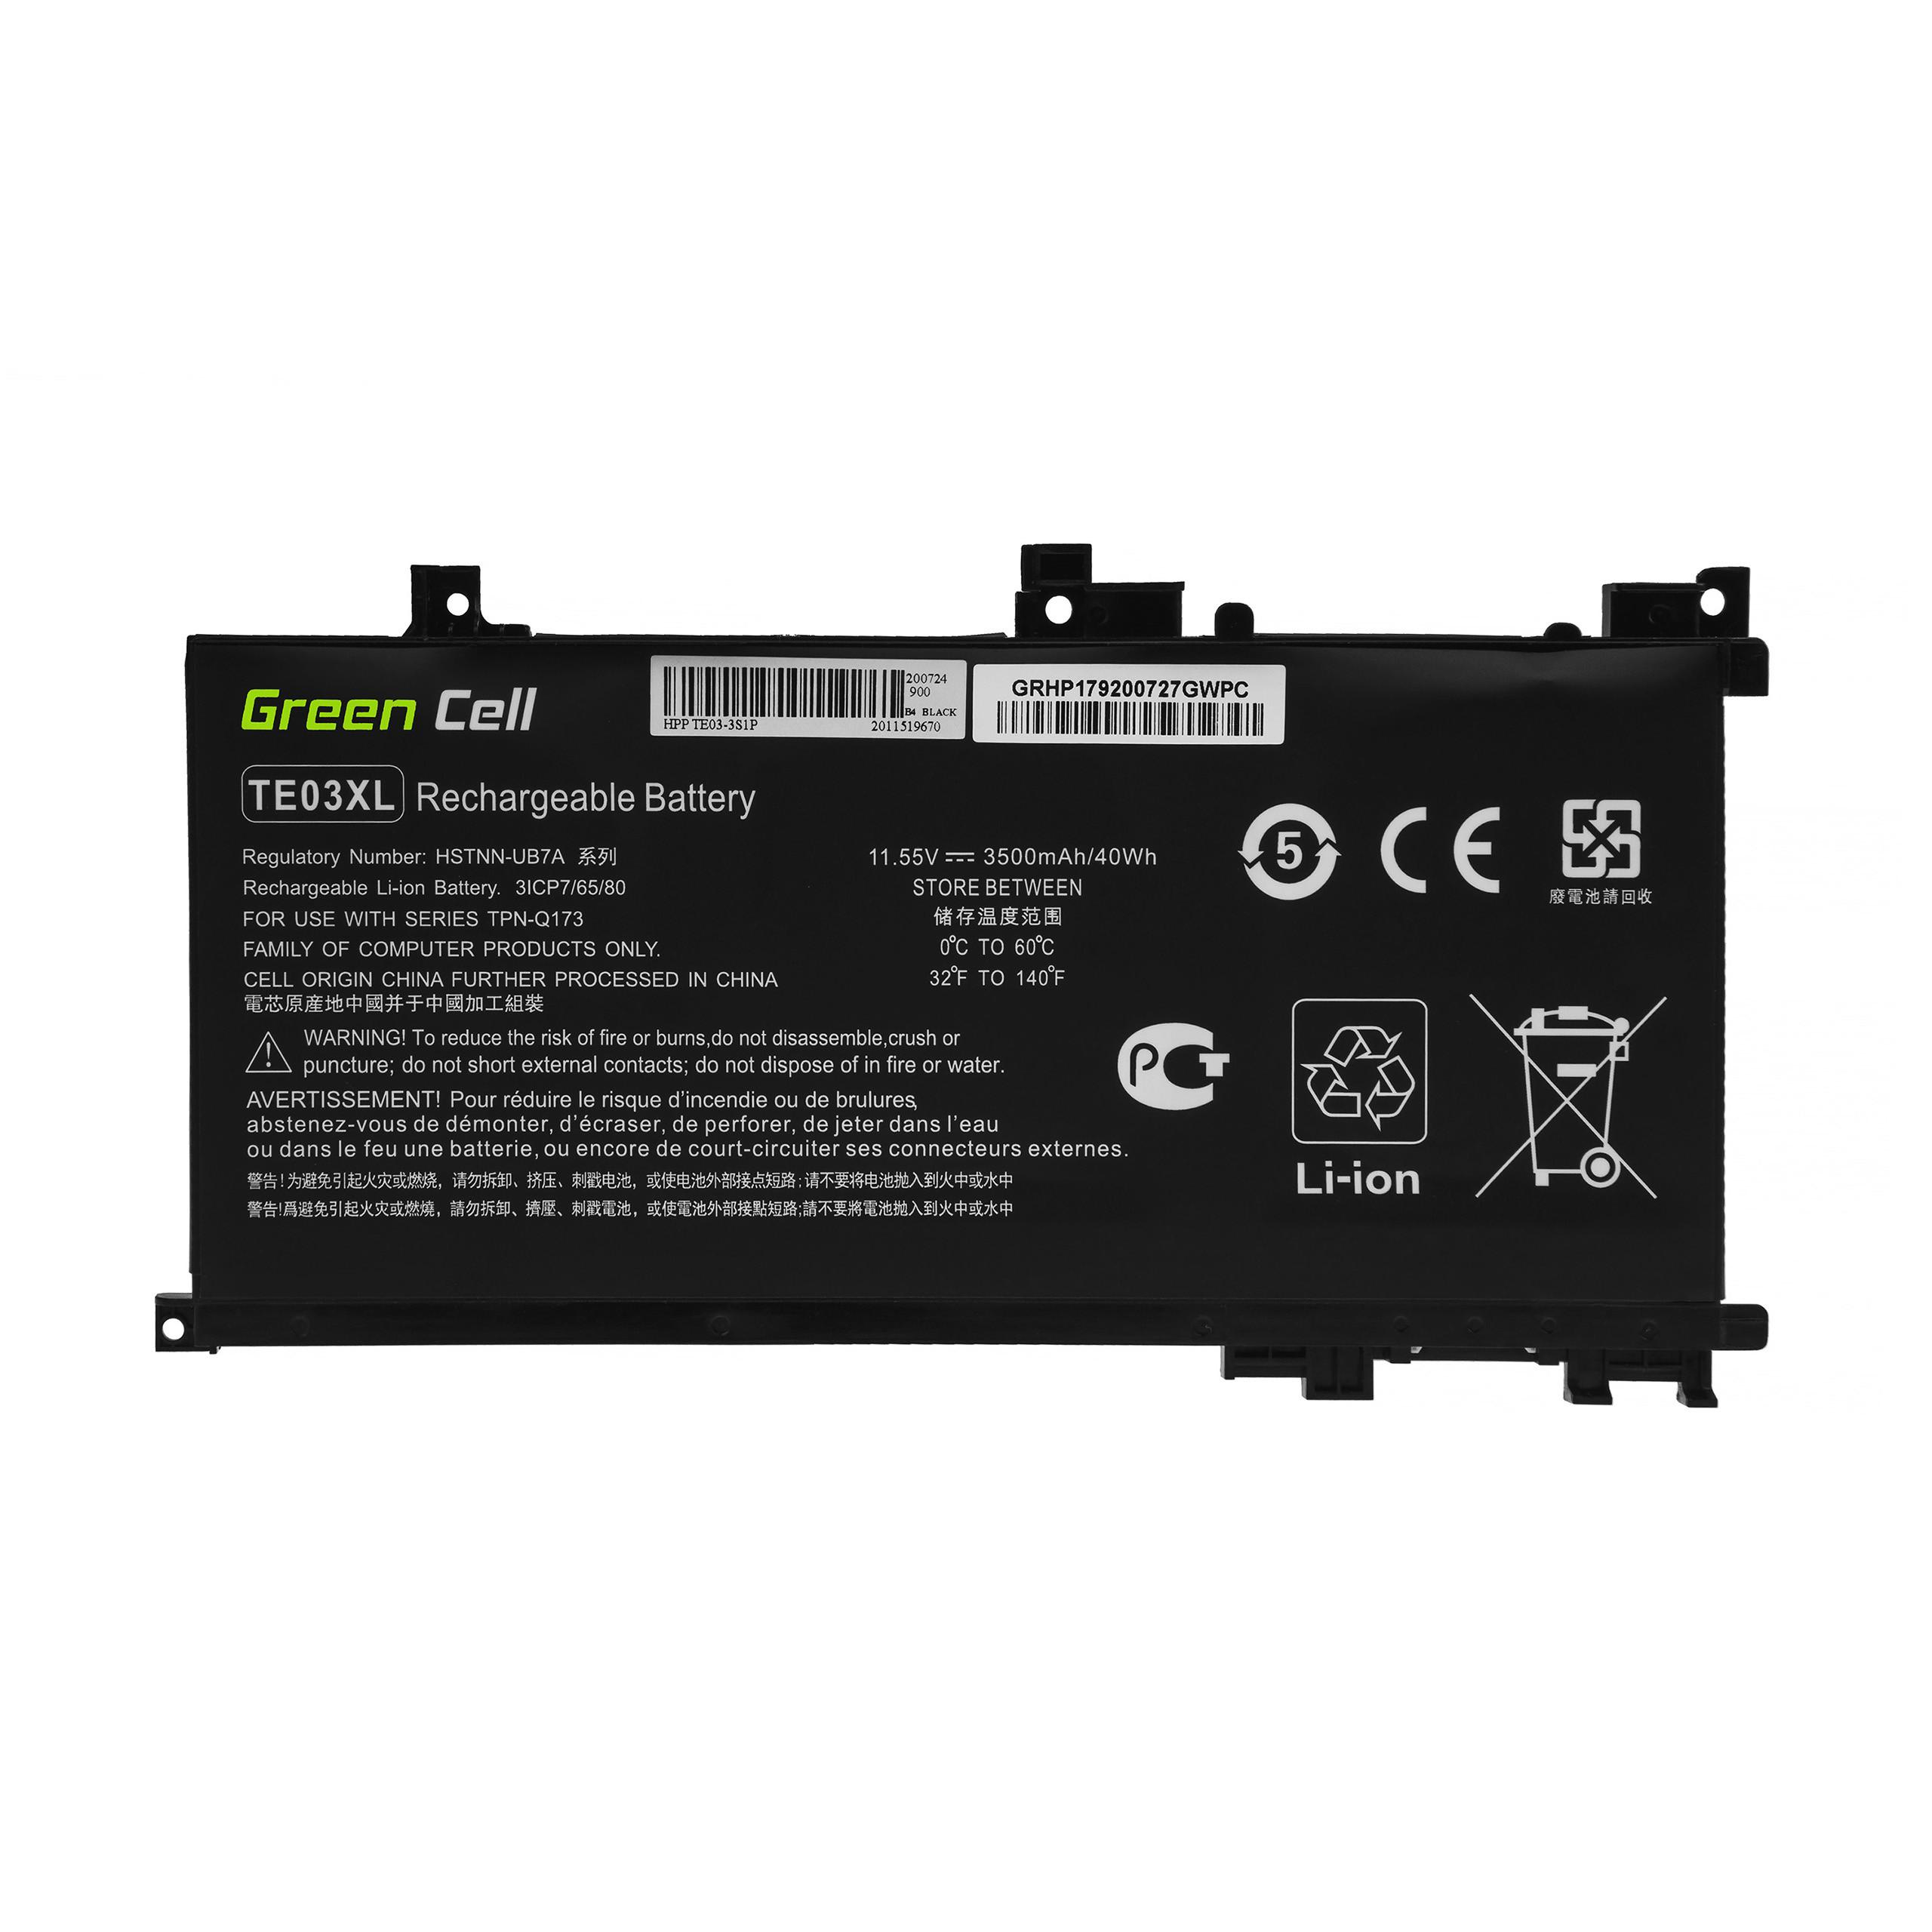 Green Cell Baterie TE03XL pro HP Omen 15-AX052NW 15-AX055NW 15-AX075NW 15-AX099NW, HP Pavilion 15-BC402NW 15-BC408NW 15-BC411NW